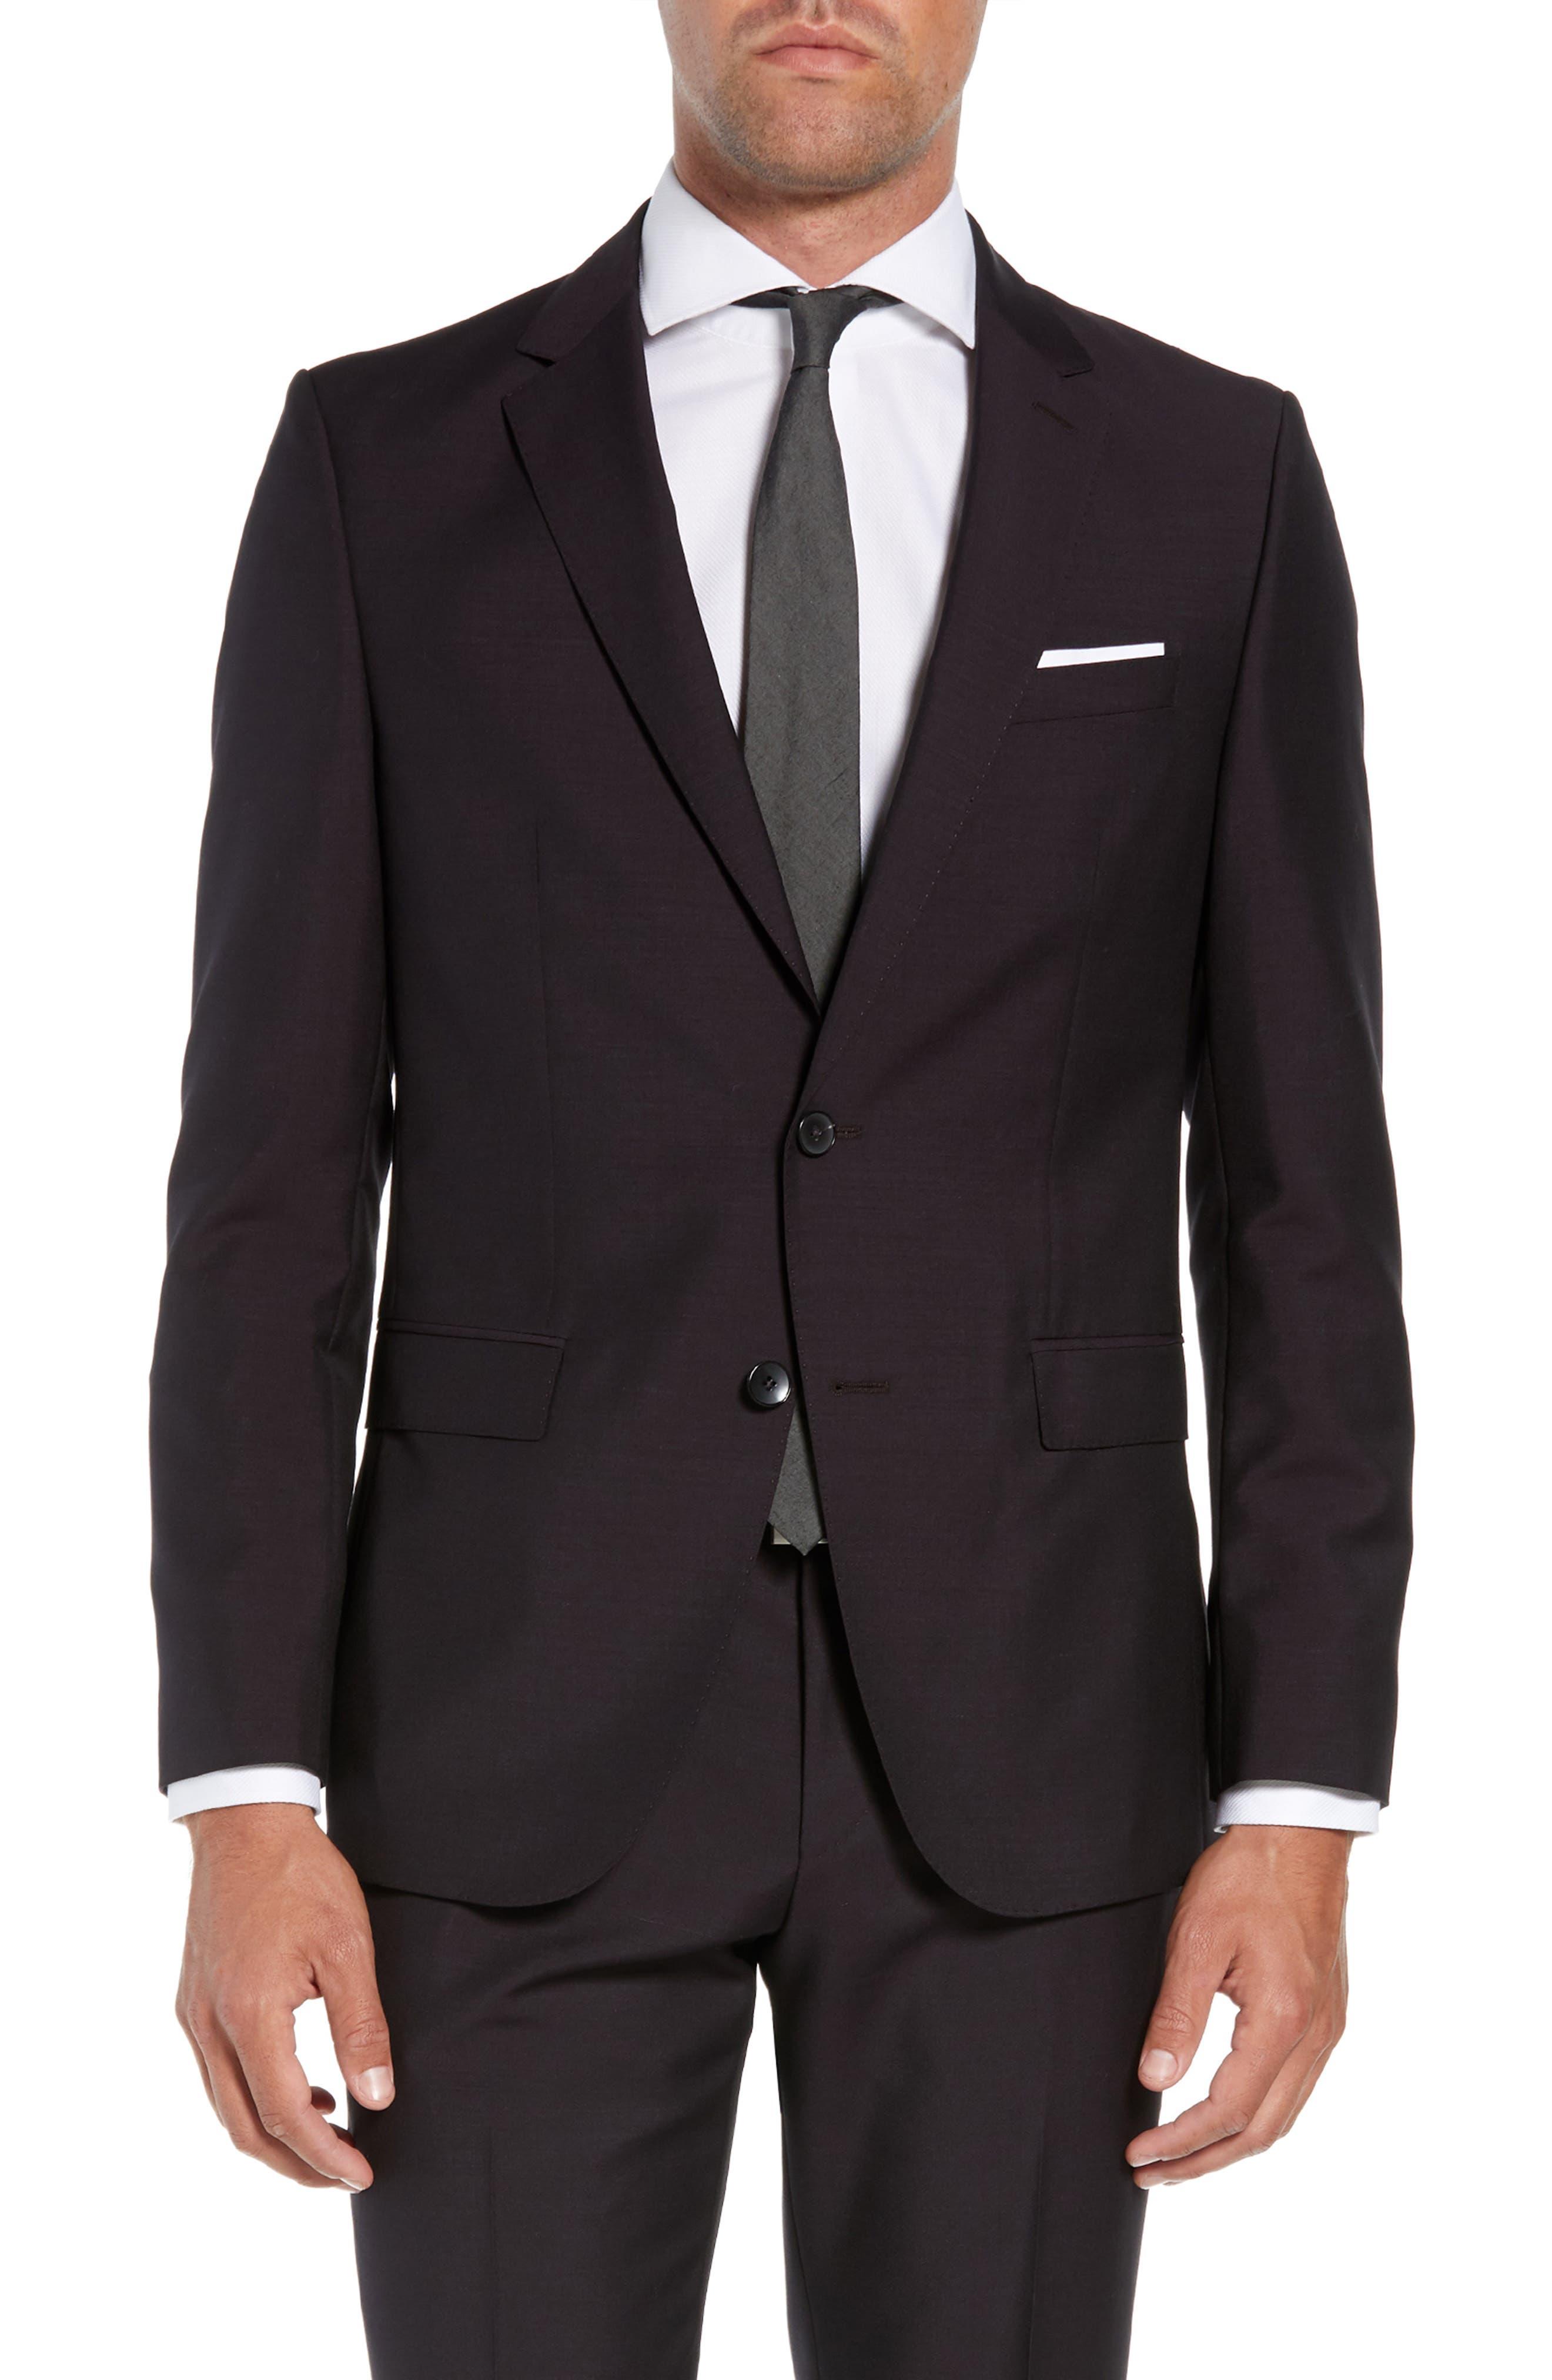 Novan/Ben Trim Fit Solid Wool & Mohair Suit,                             Alternate thumbnail 5, color,                             DARK PURPLE